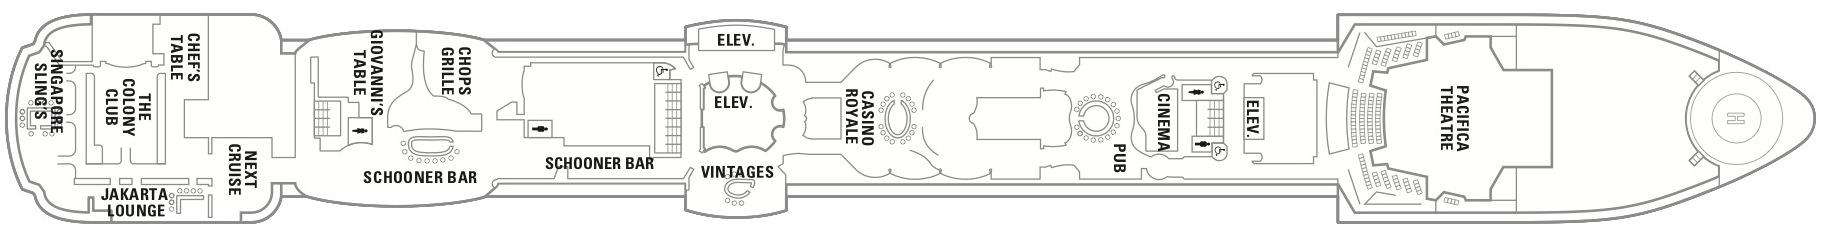 Royal Caribbean International Brilliance of the Seas Deck Plans Deck 6.jpeg